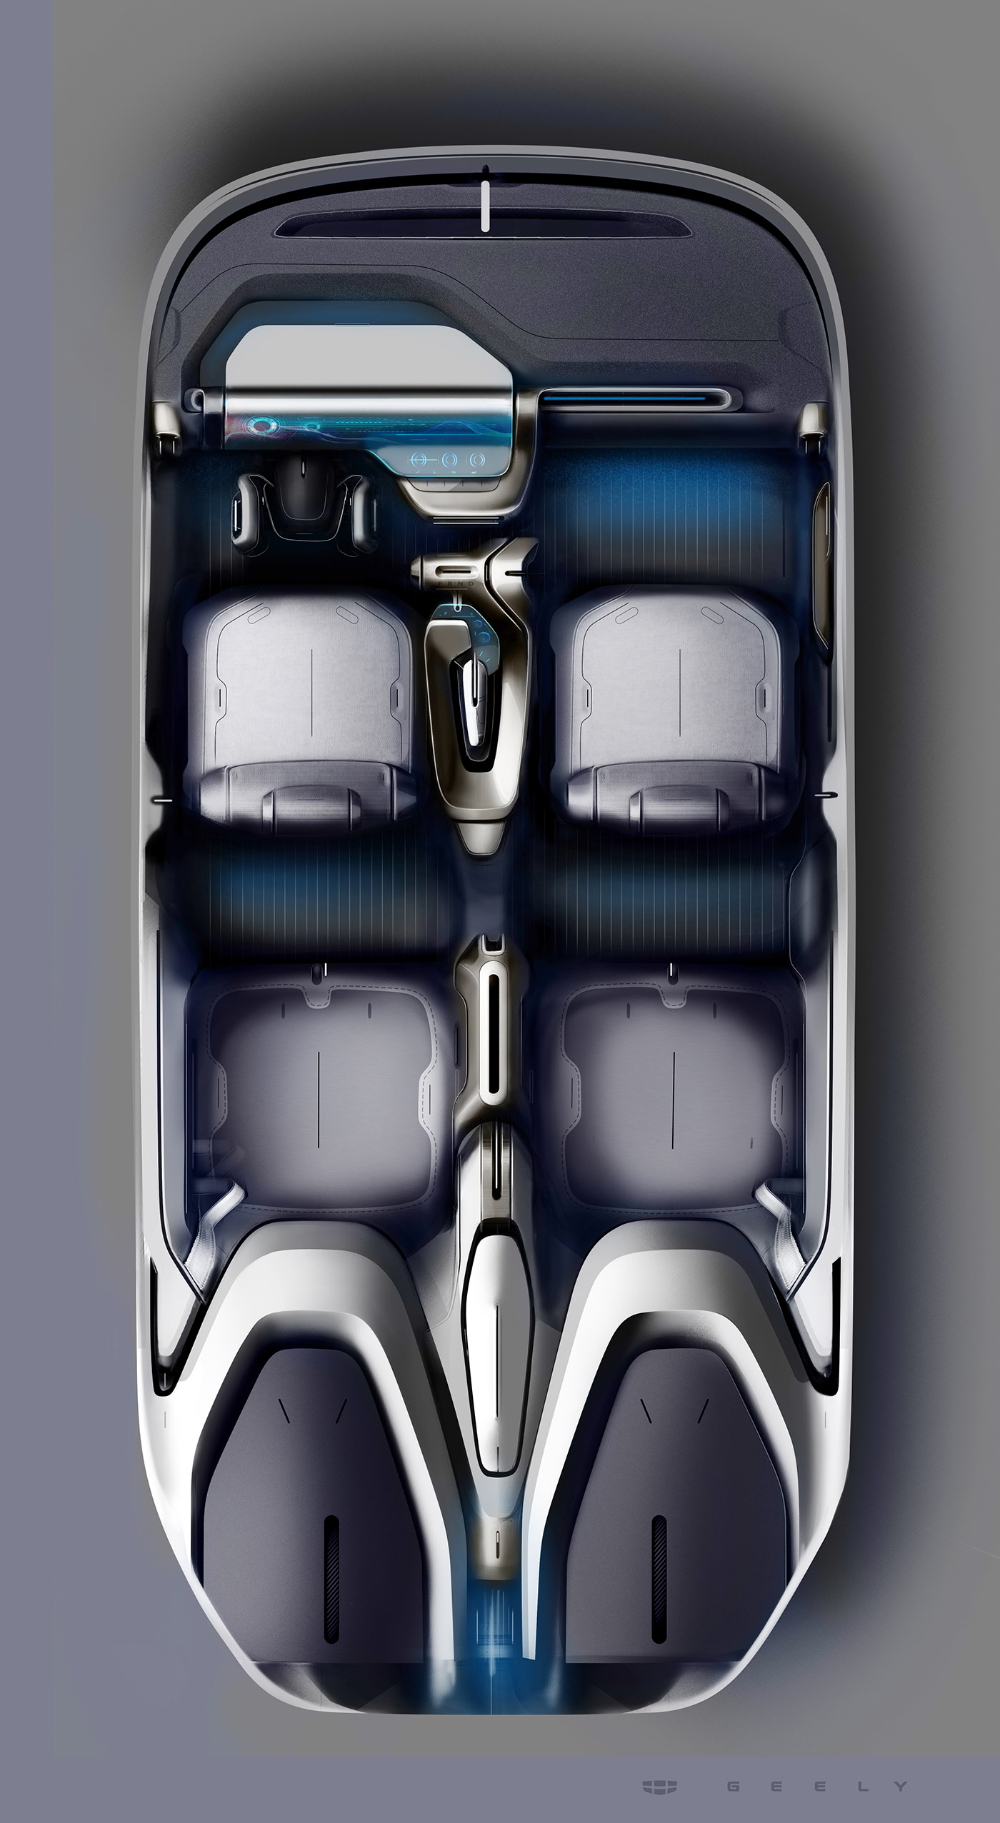 Geely Interior sketches on Behance in 2020 Interior